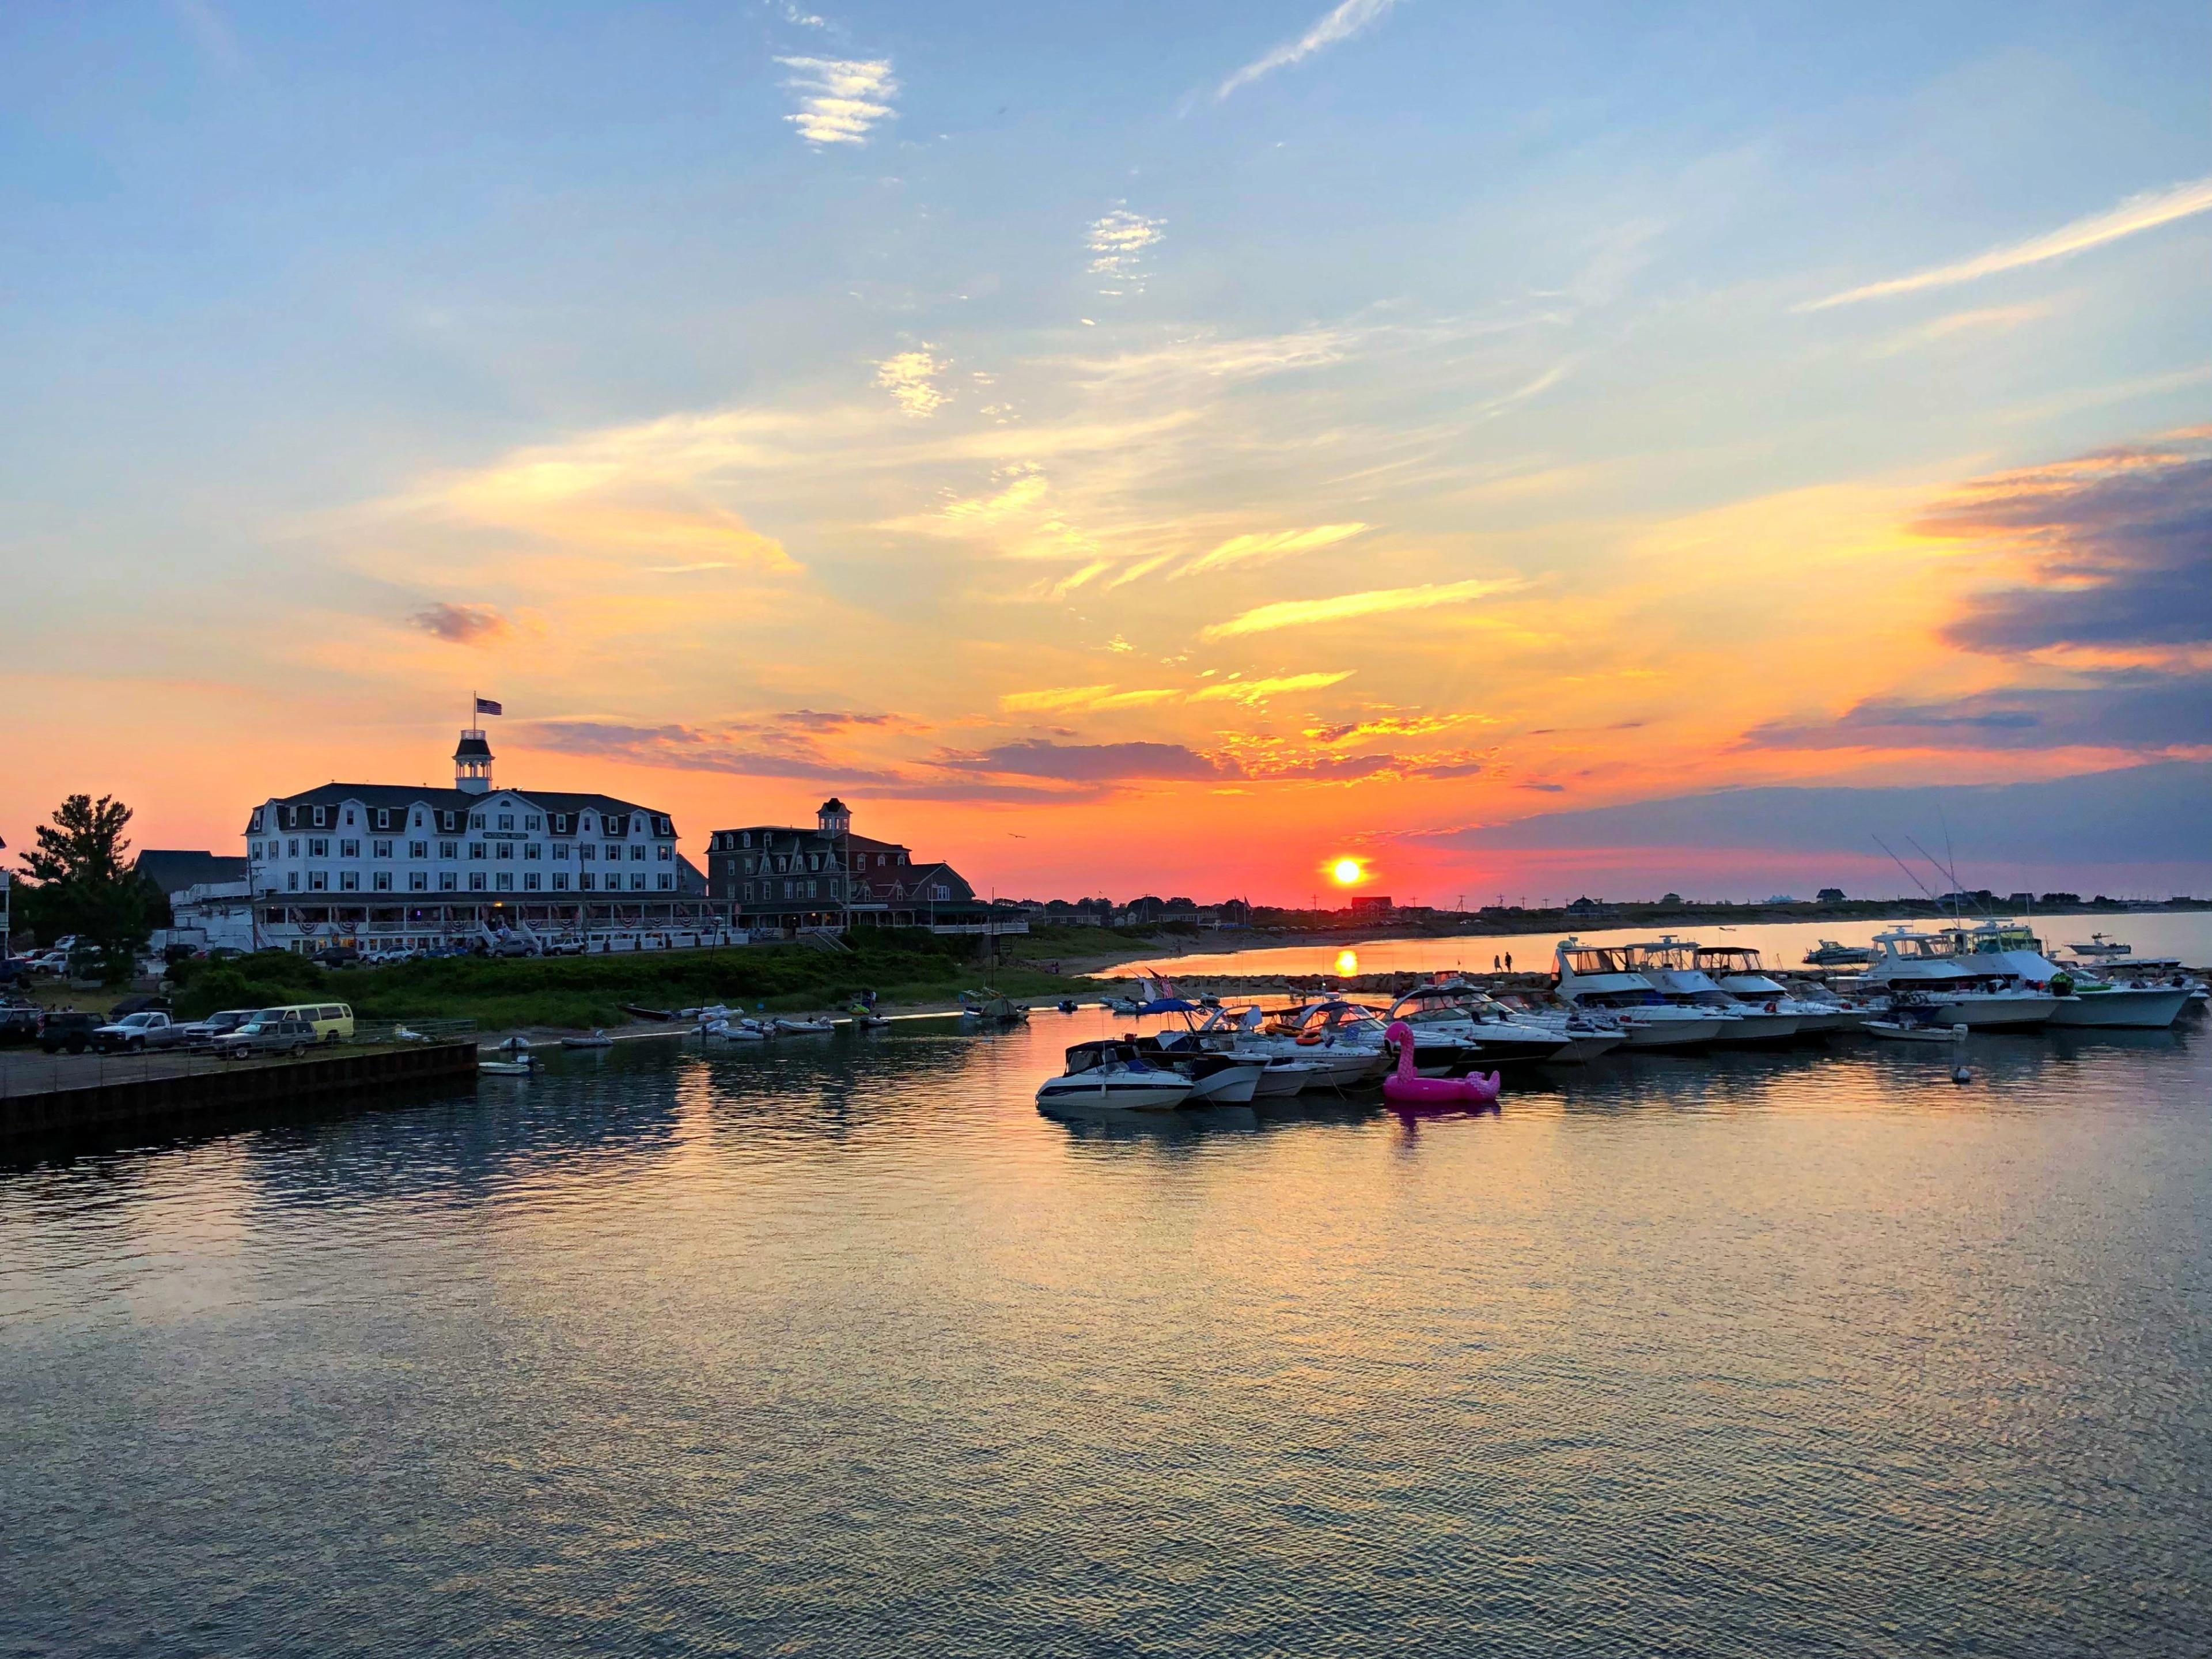 Old Harbor, Rhode Island, United States of America